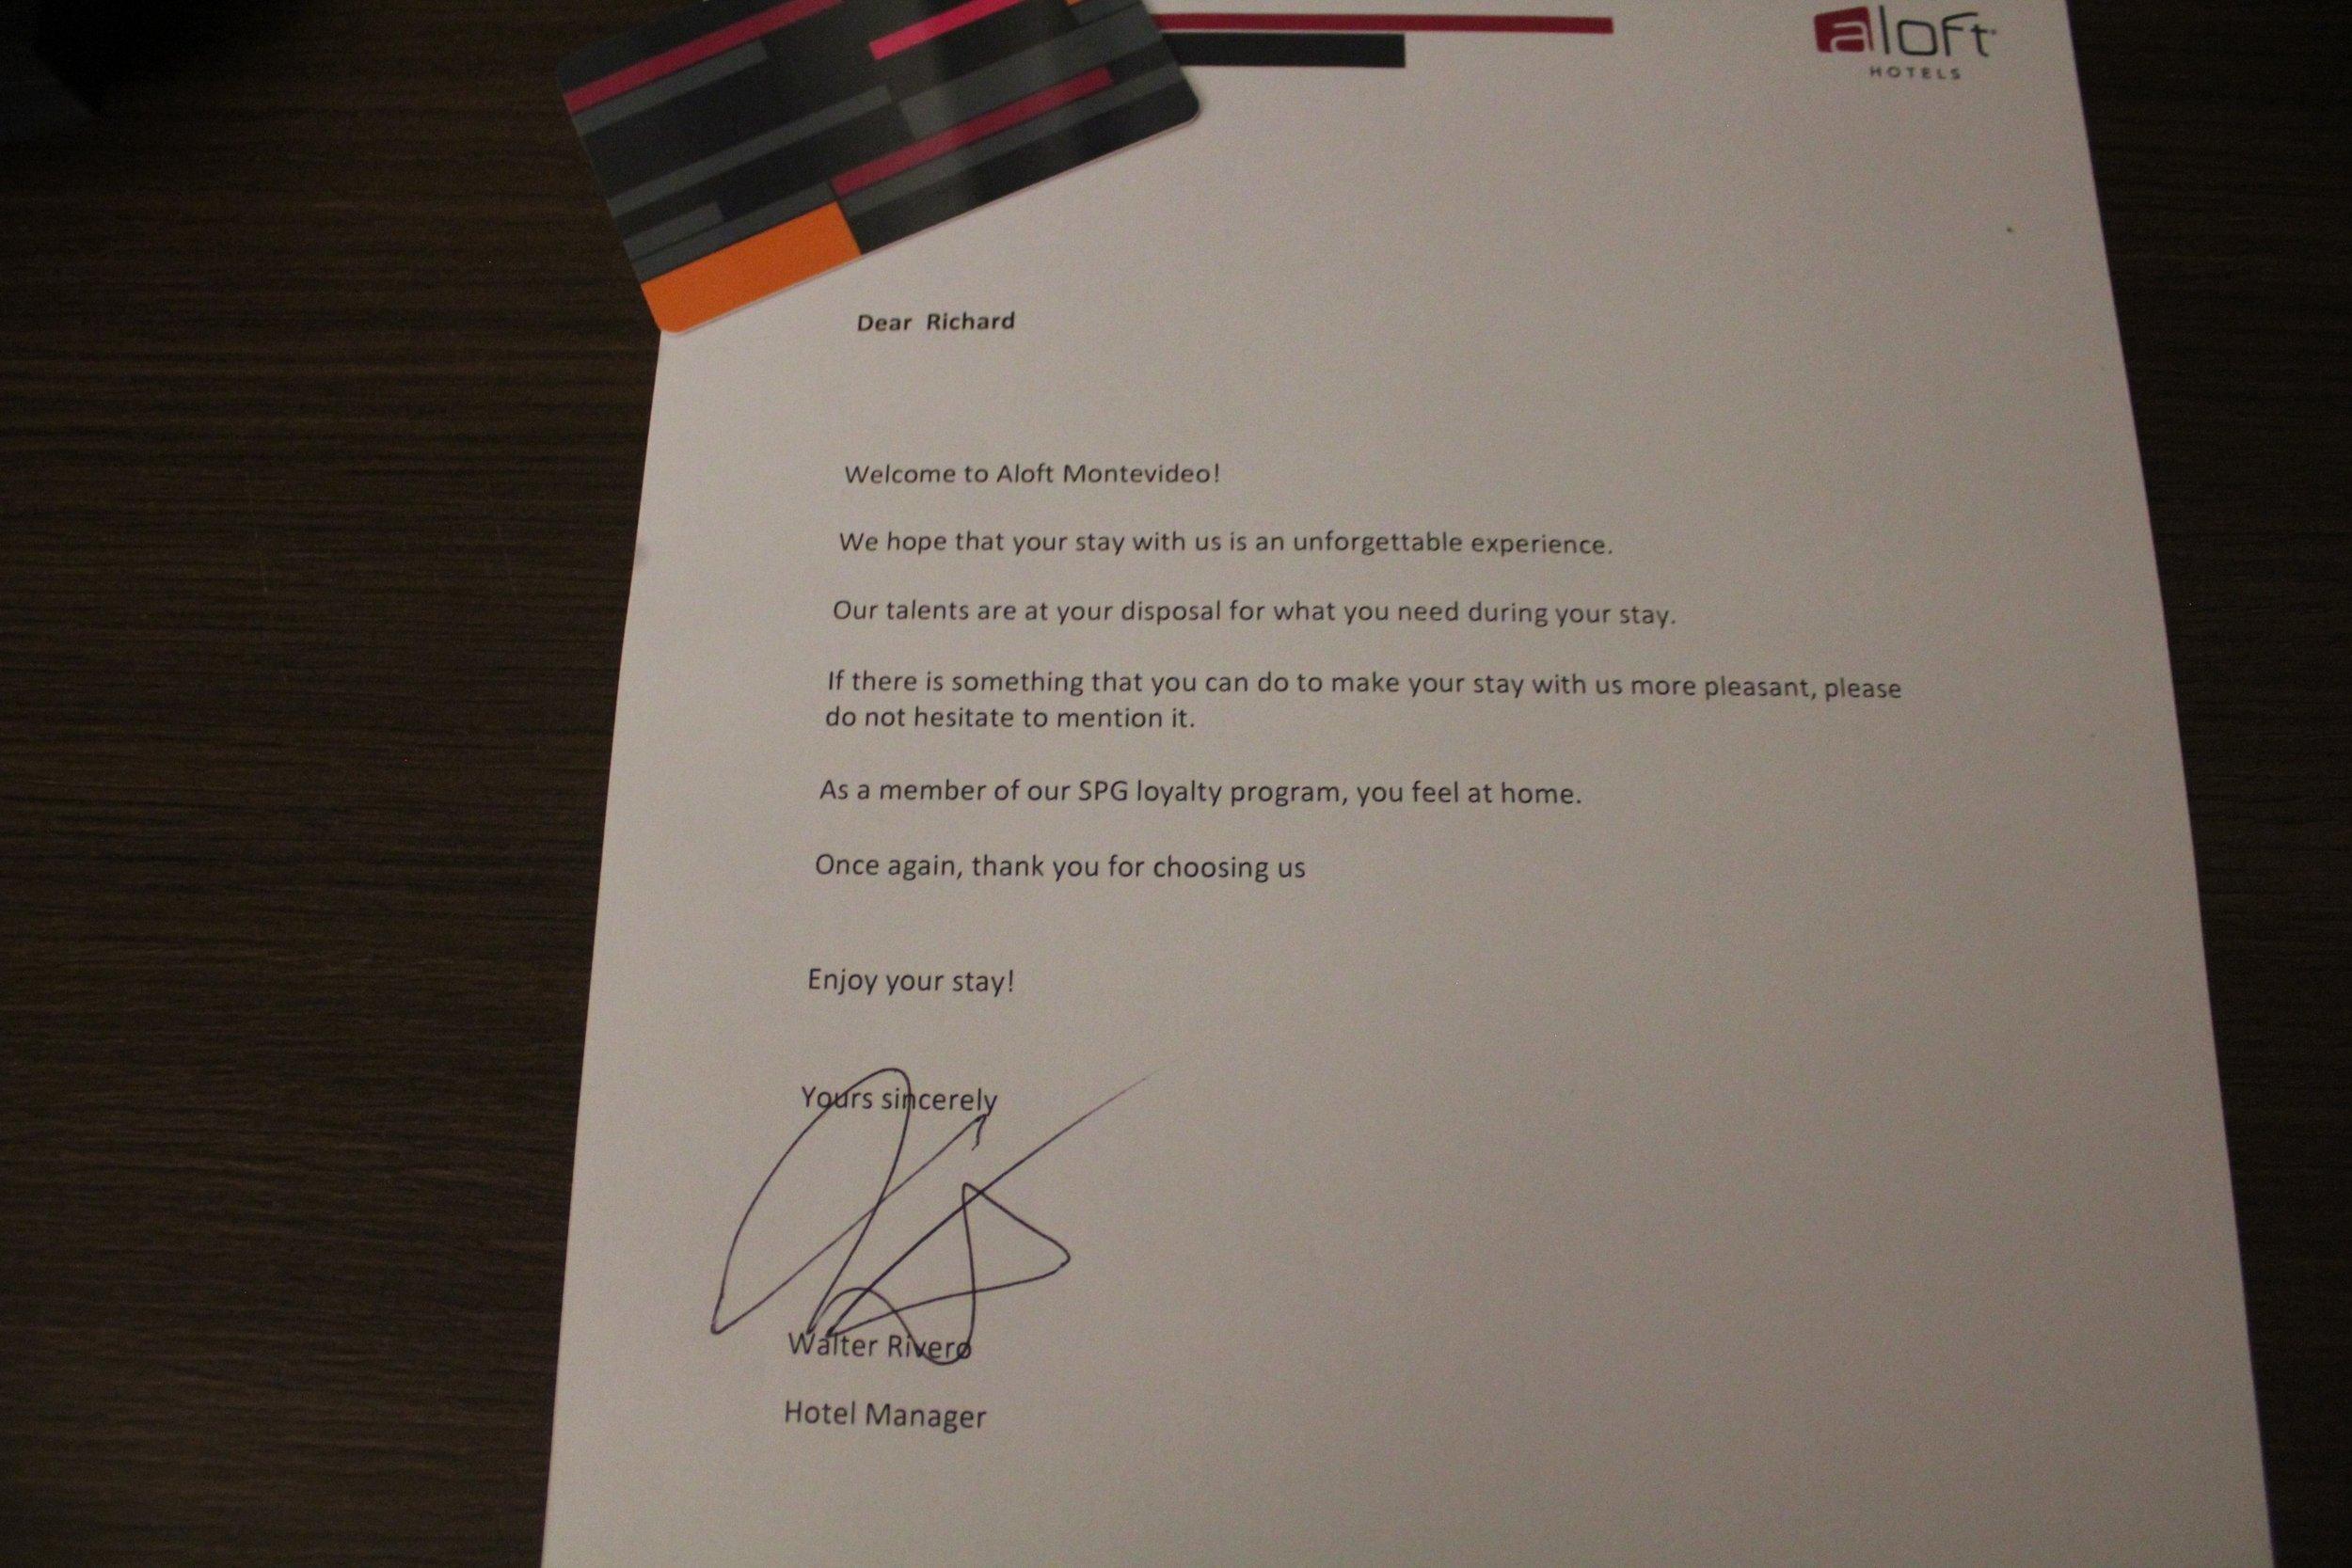 Aloft Montevideo – Welcome letter